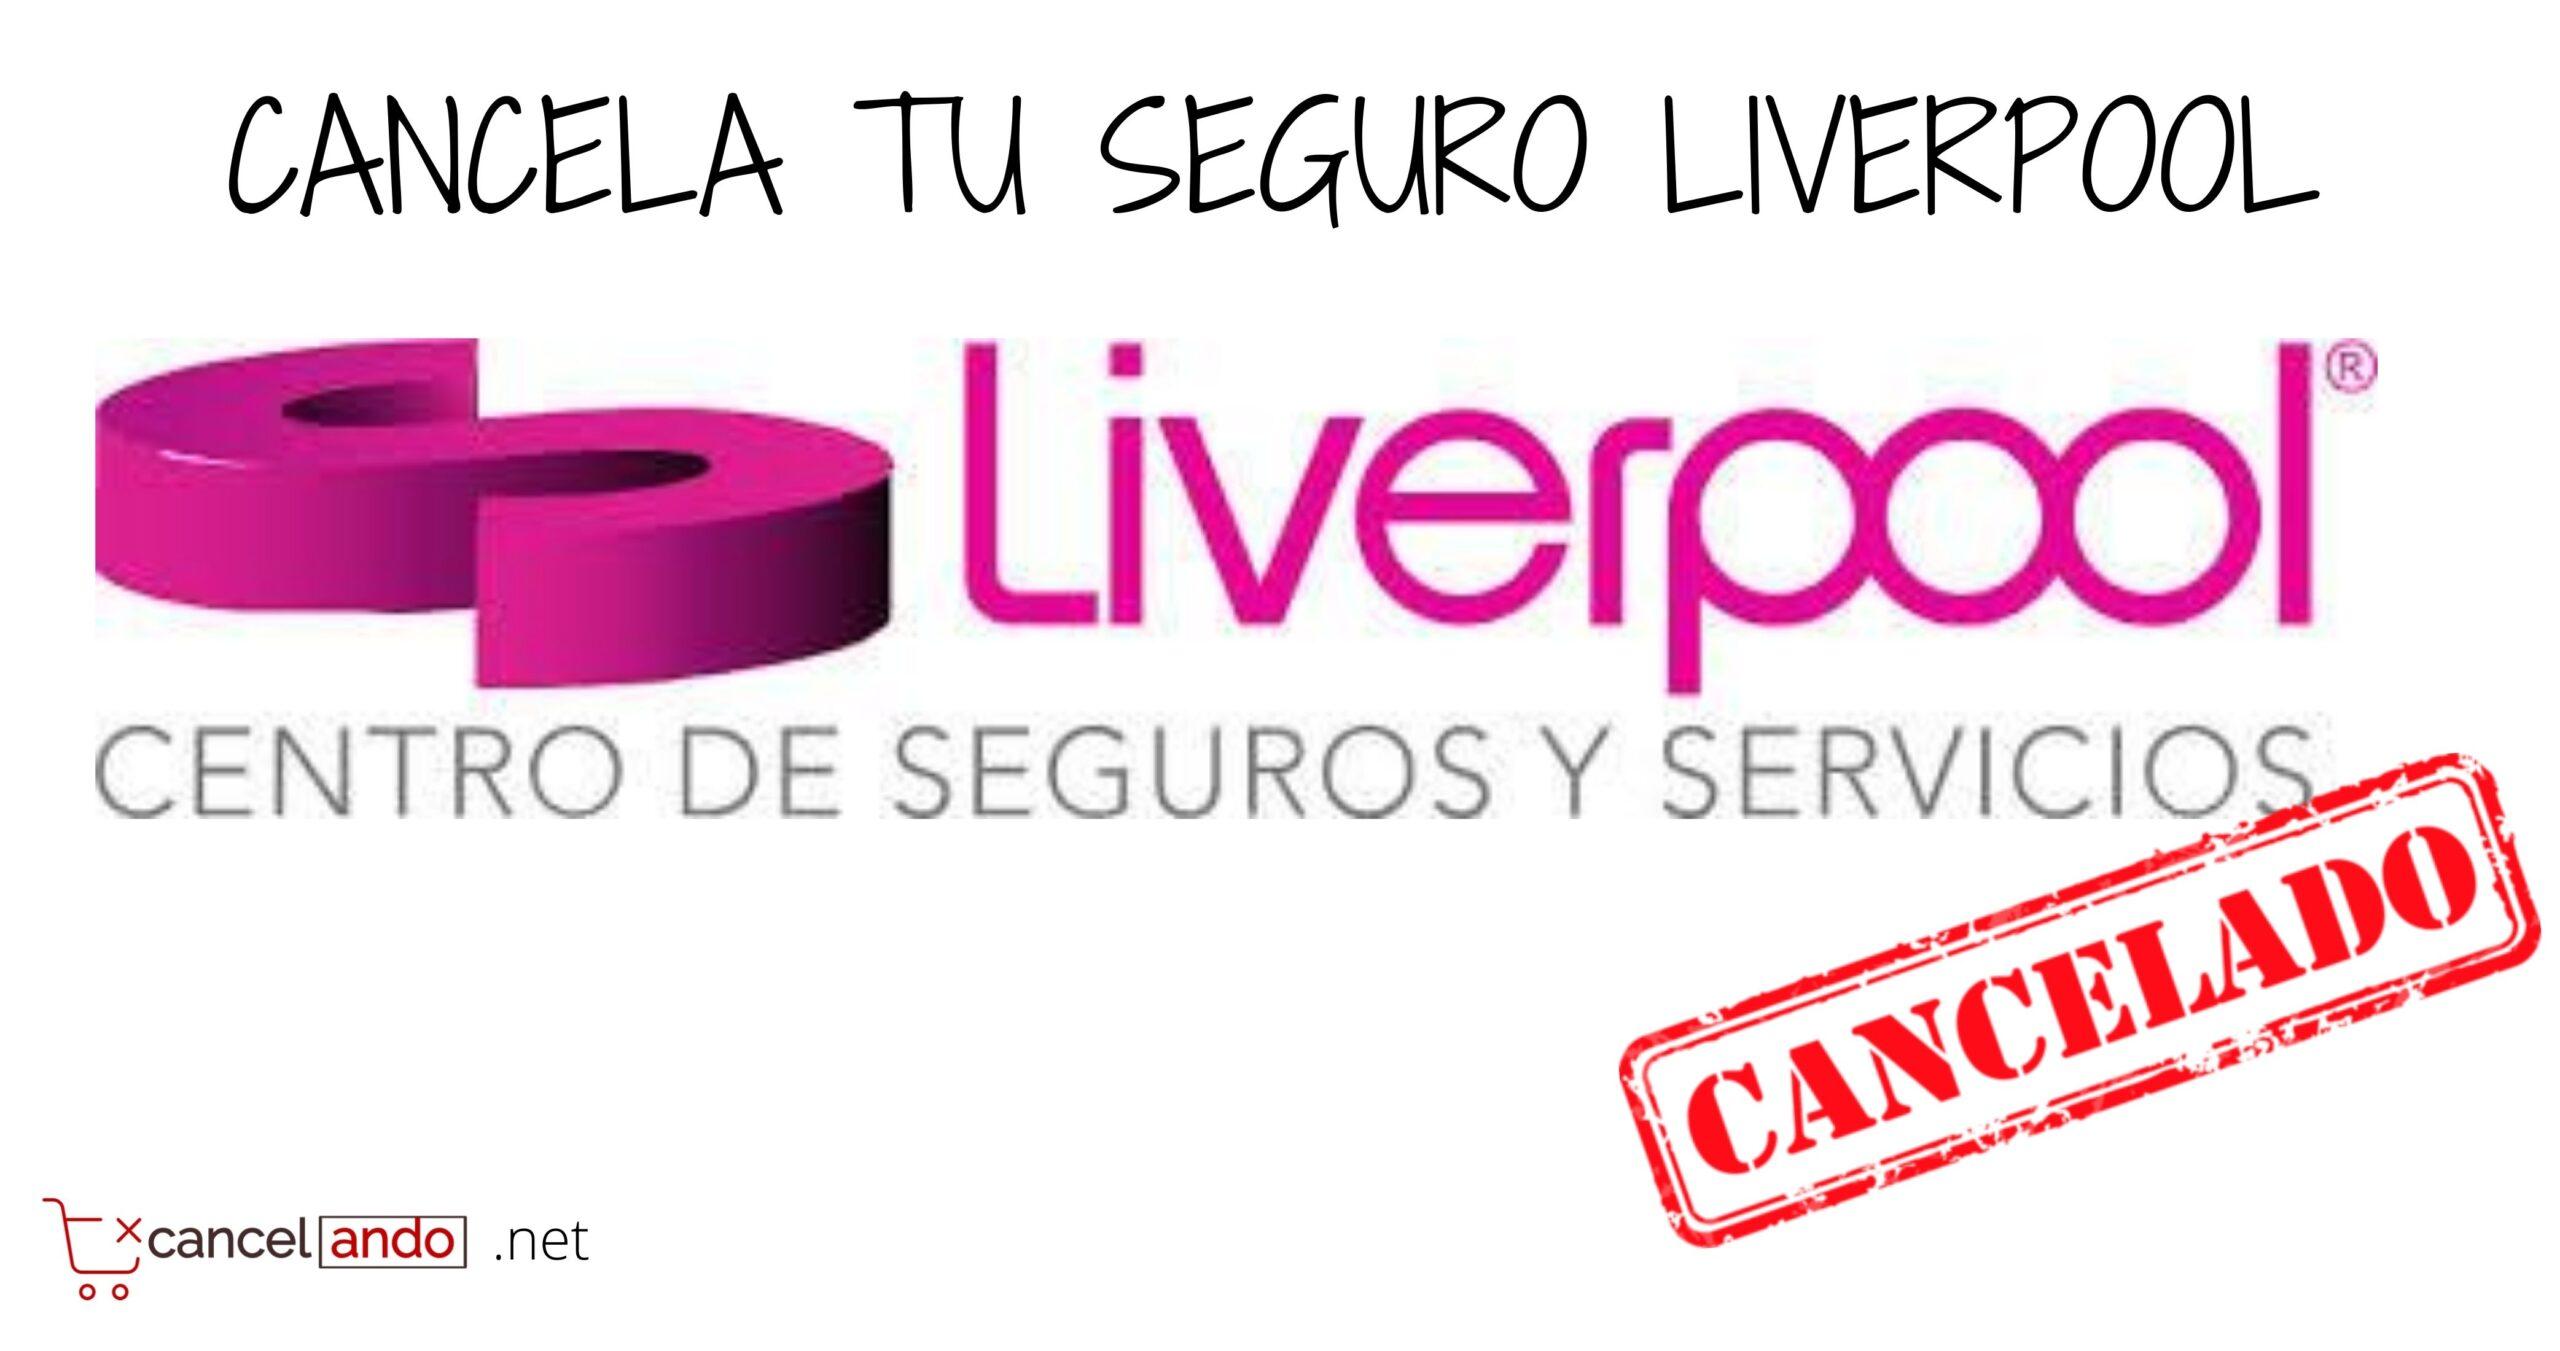 cancelar seguro liverpool